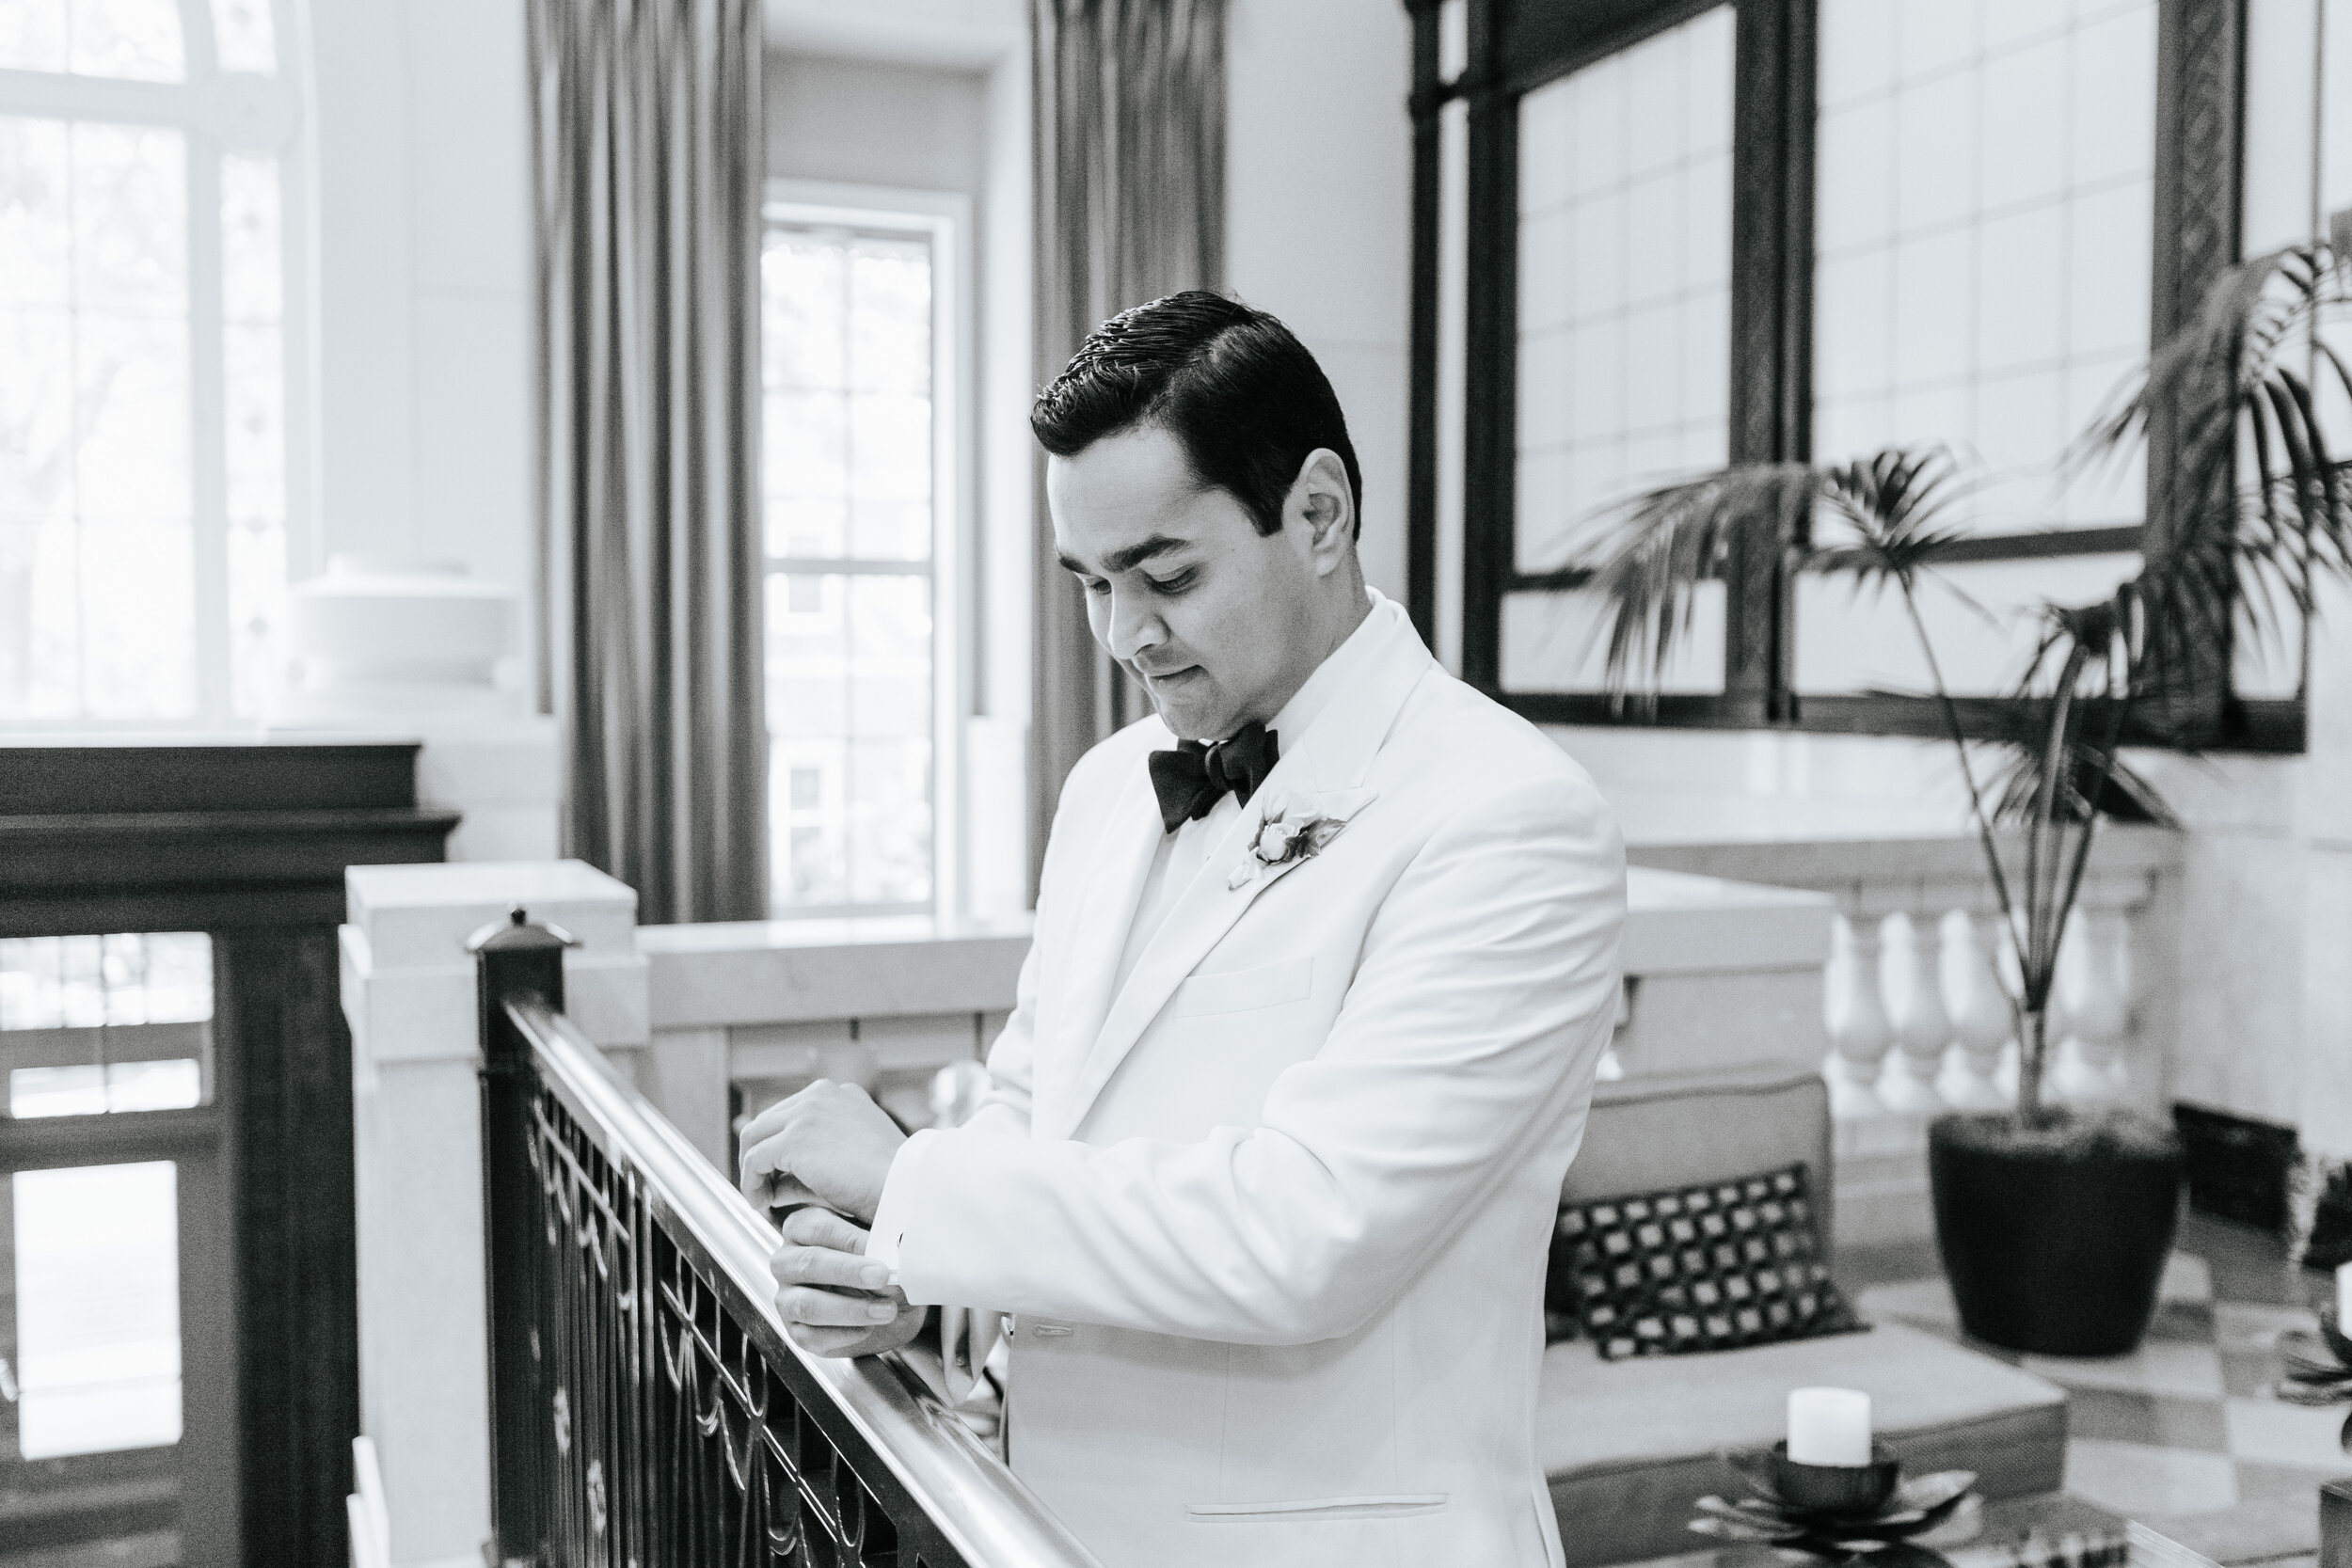 Cassie-Mrunal-Wedding-Quirk-Hotel-John-Marshall-Ballrooms-Richmond-Virginia-Photography-by-V-33.jpg